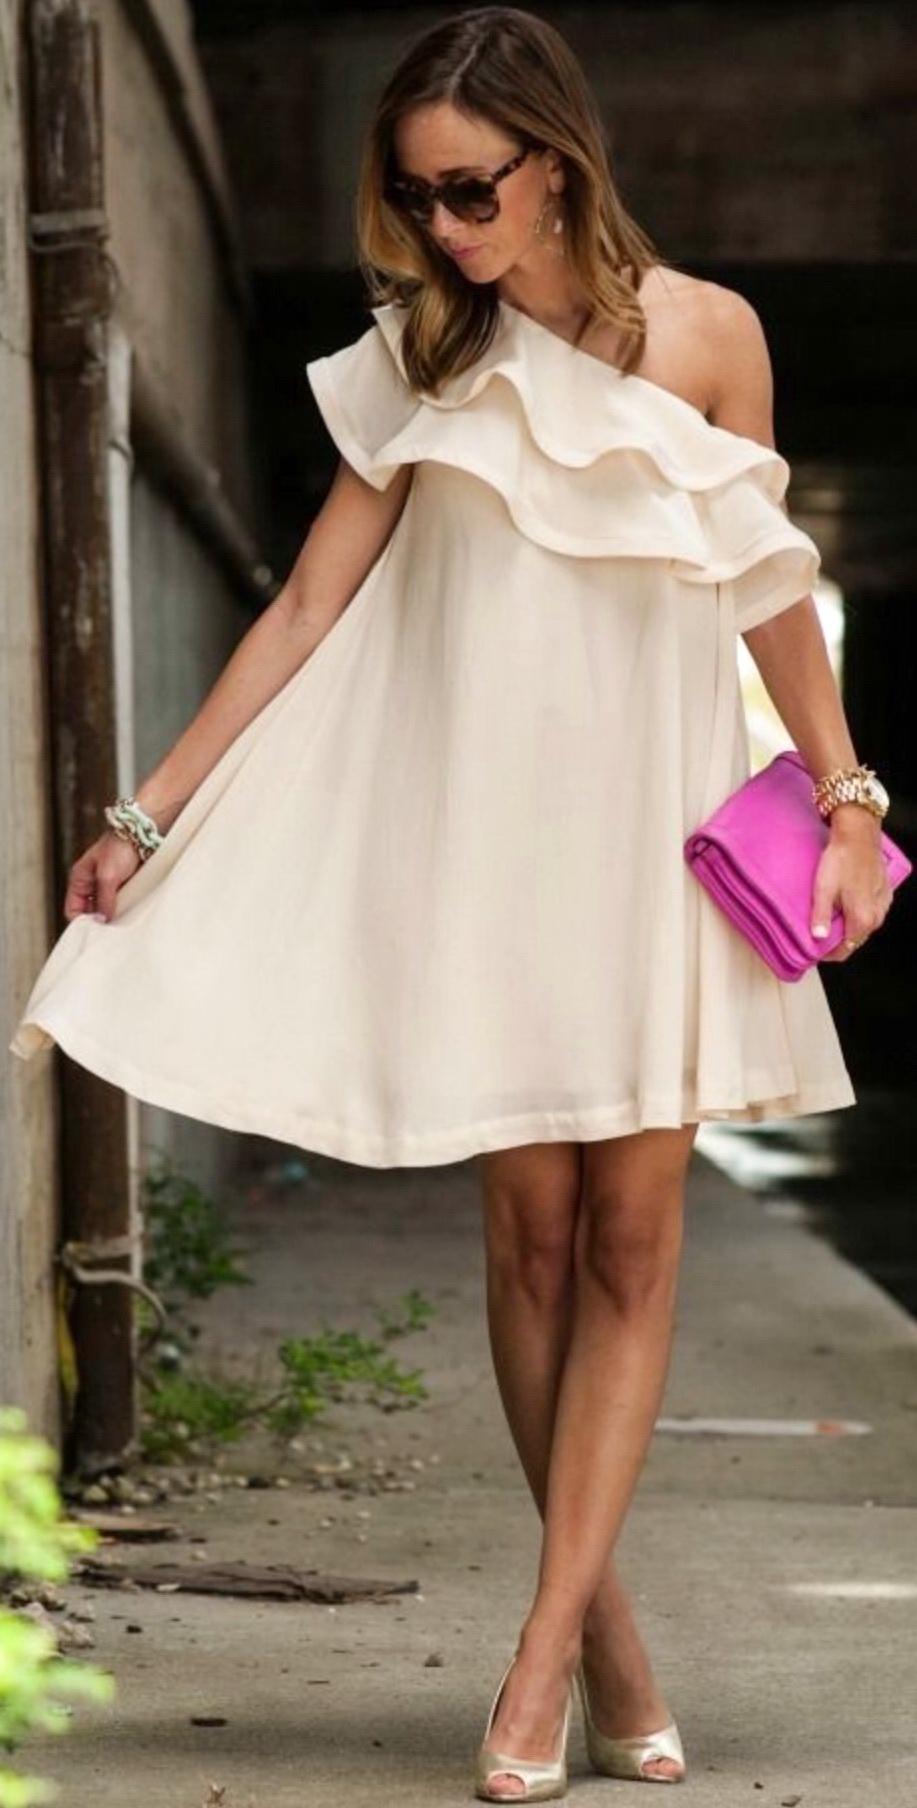 http://glamradar.com/kristina-bazan-minimalist-style-for-summer/